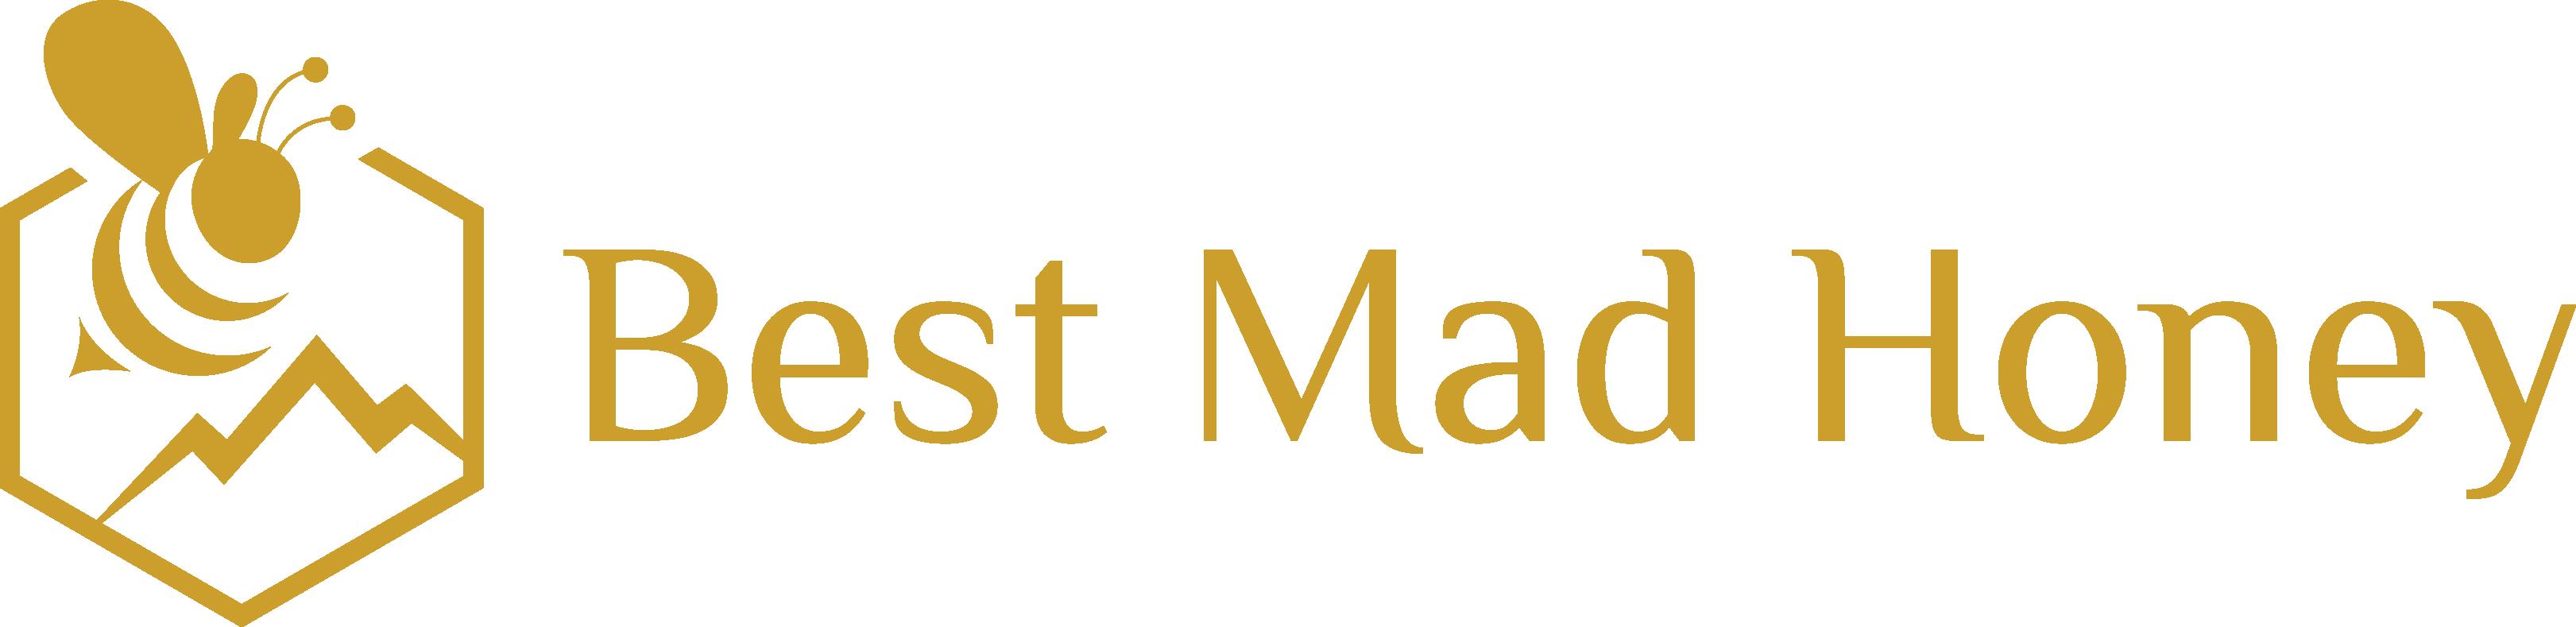 Best Mad Honey